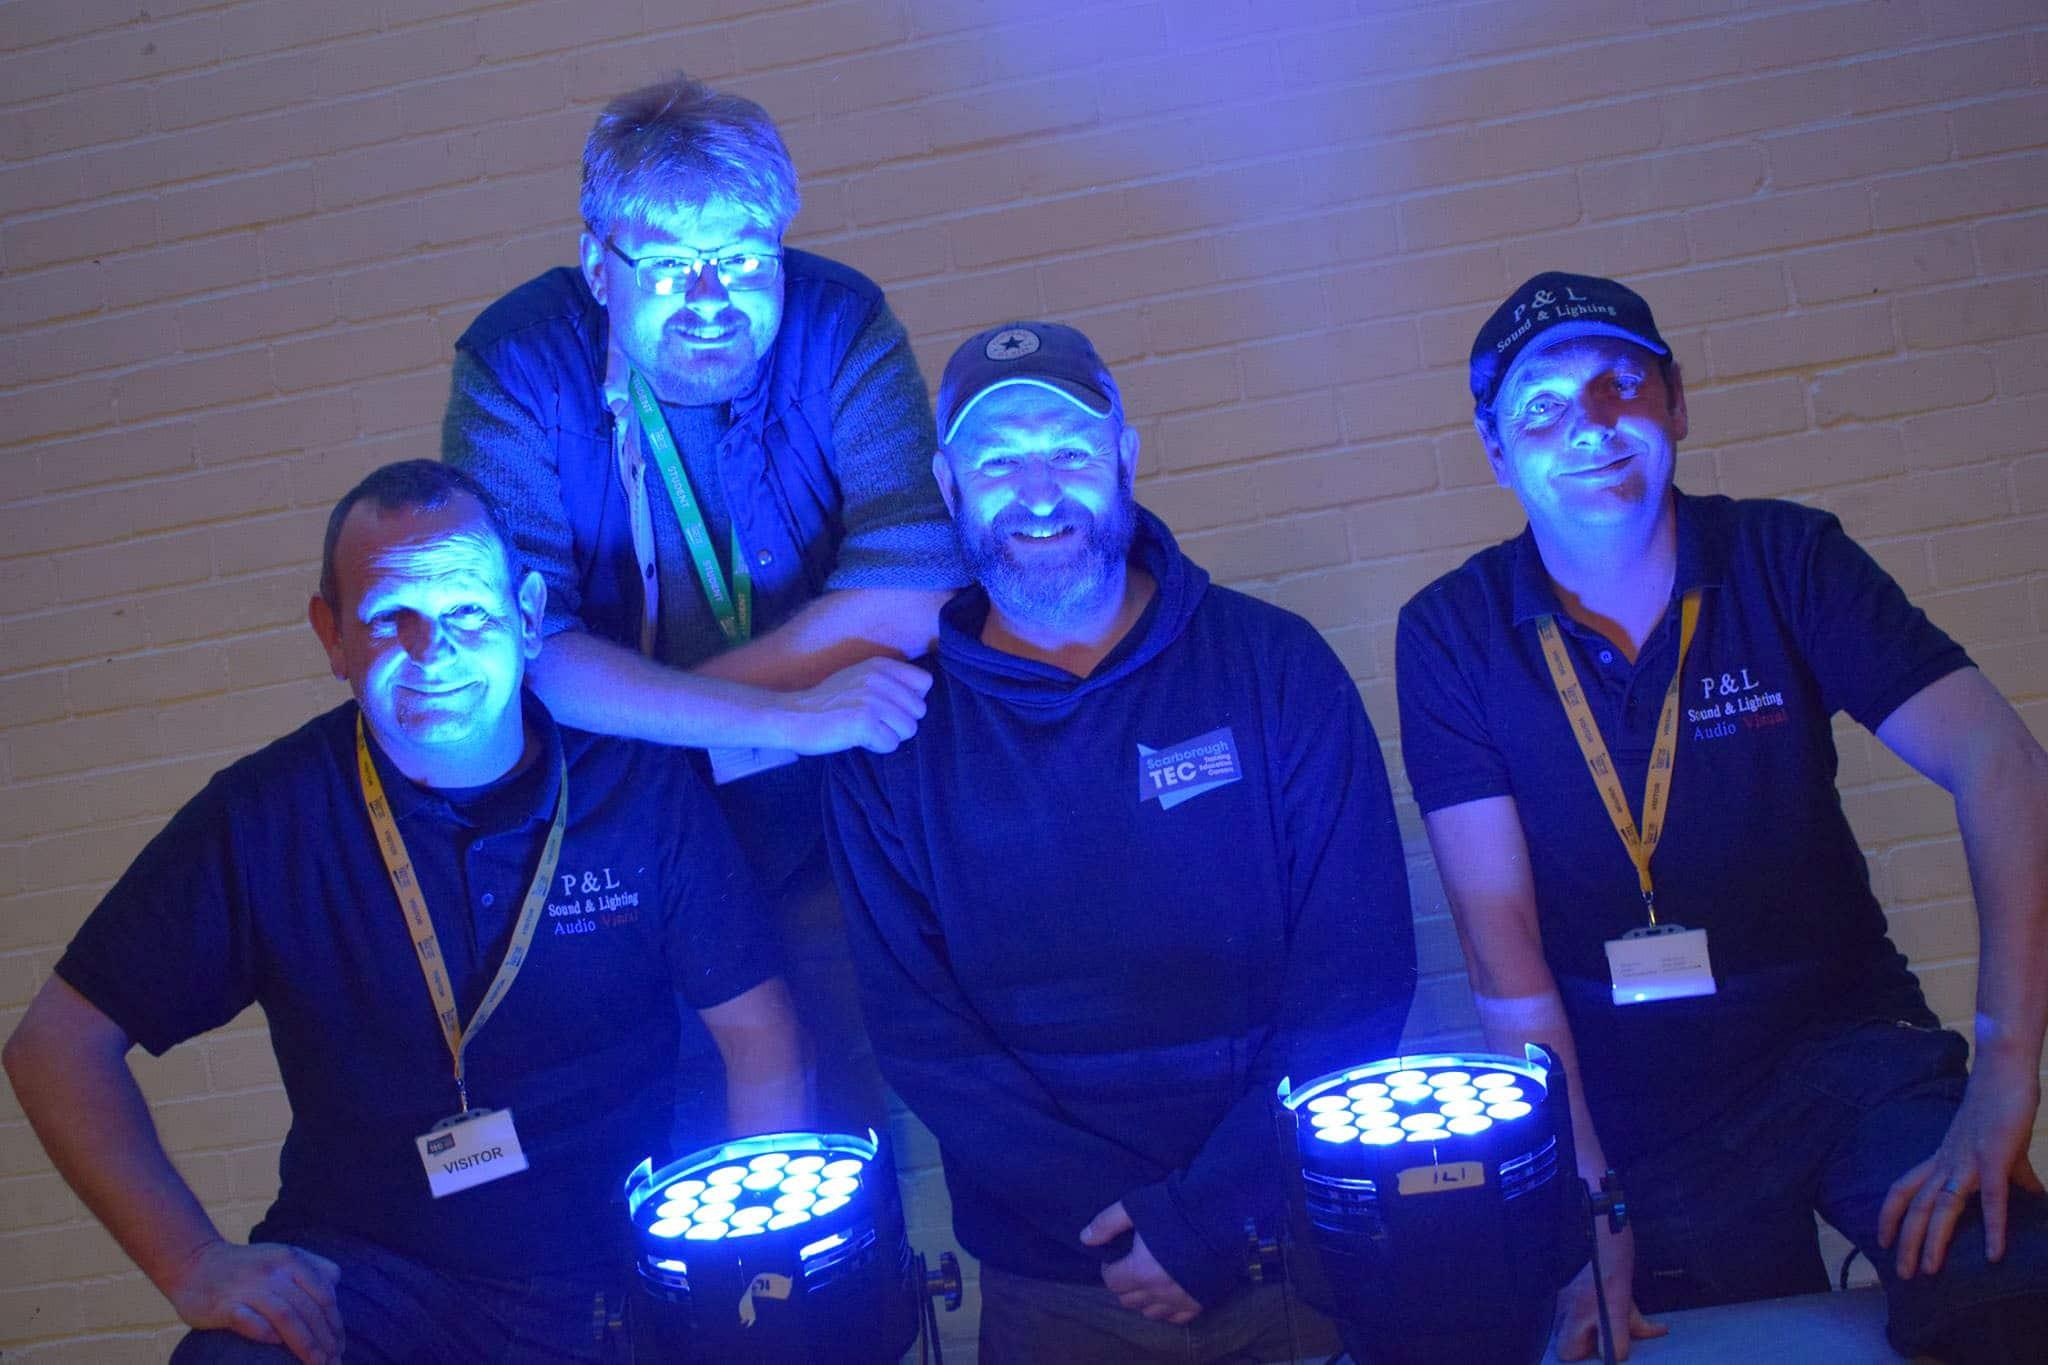 P & L Sound & Lighting offer Electrical students illuminating workshop